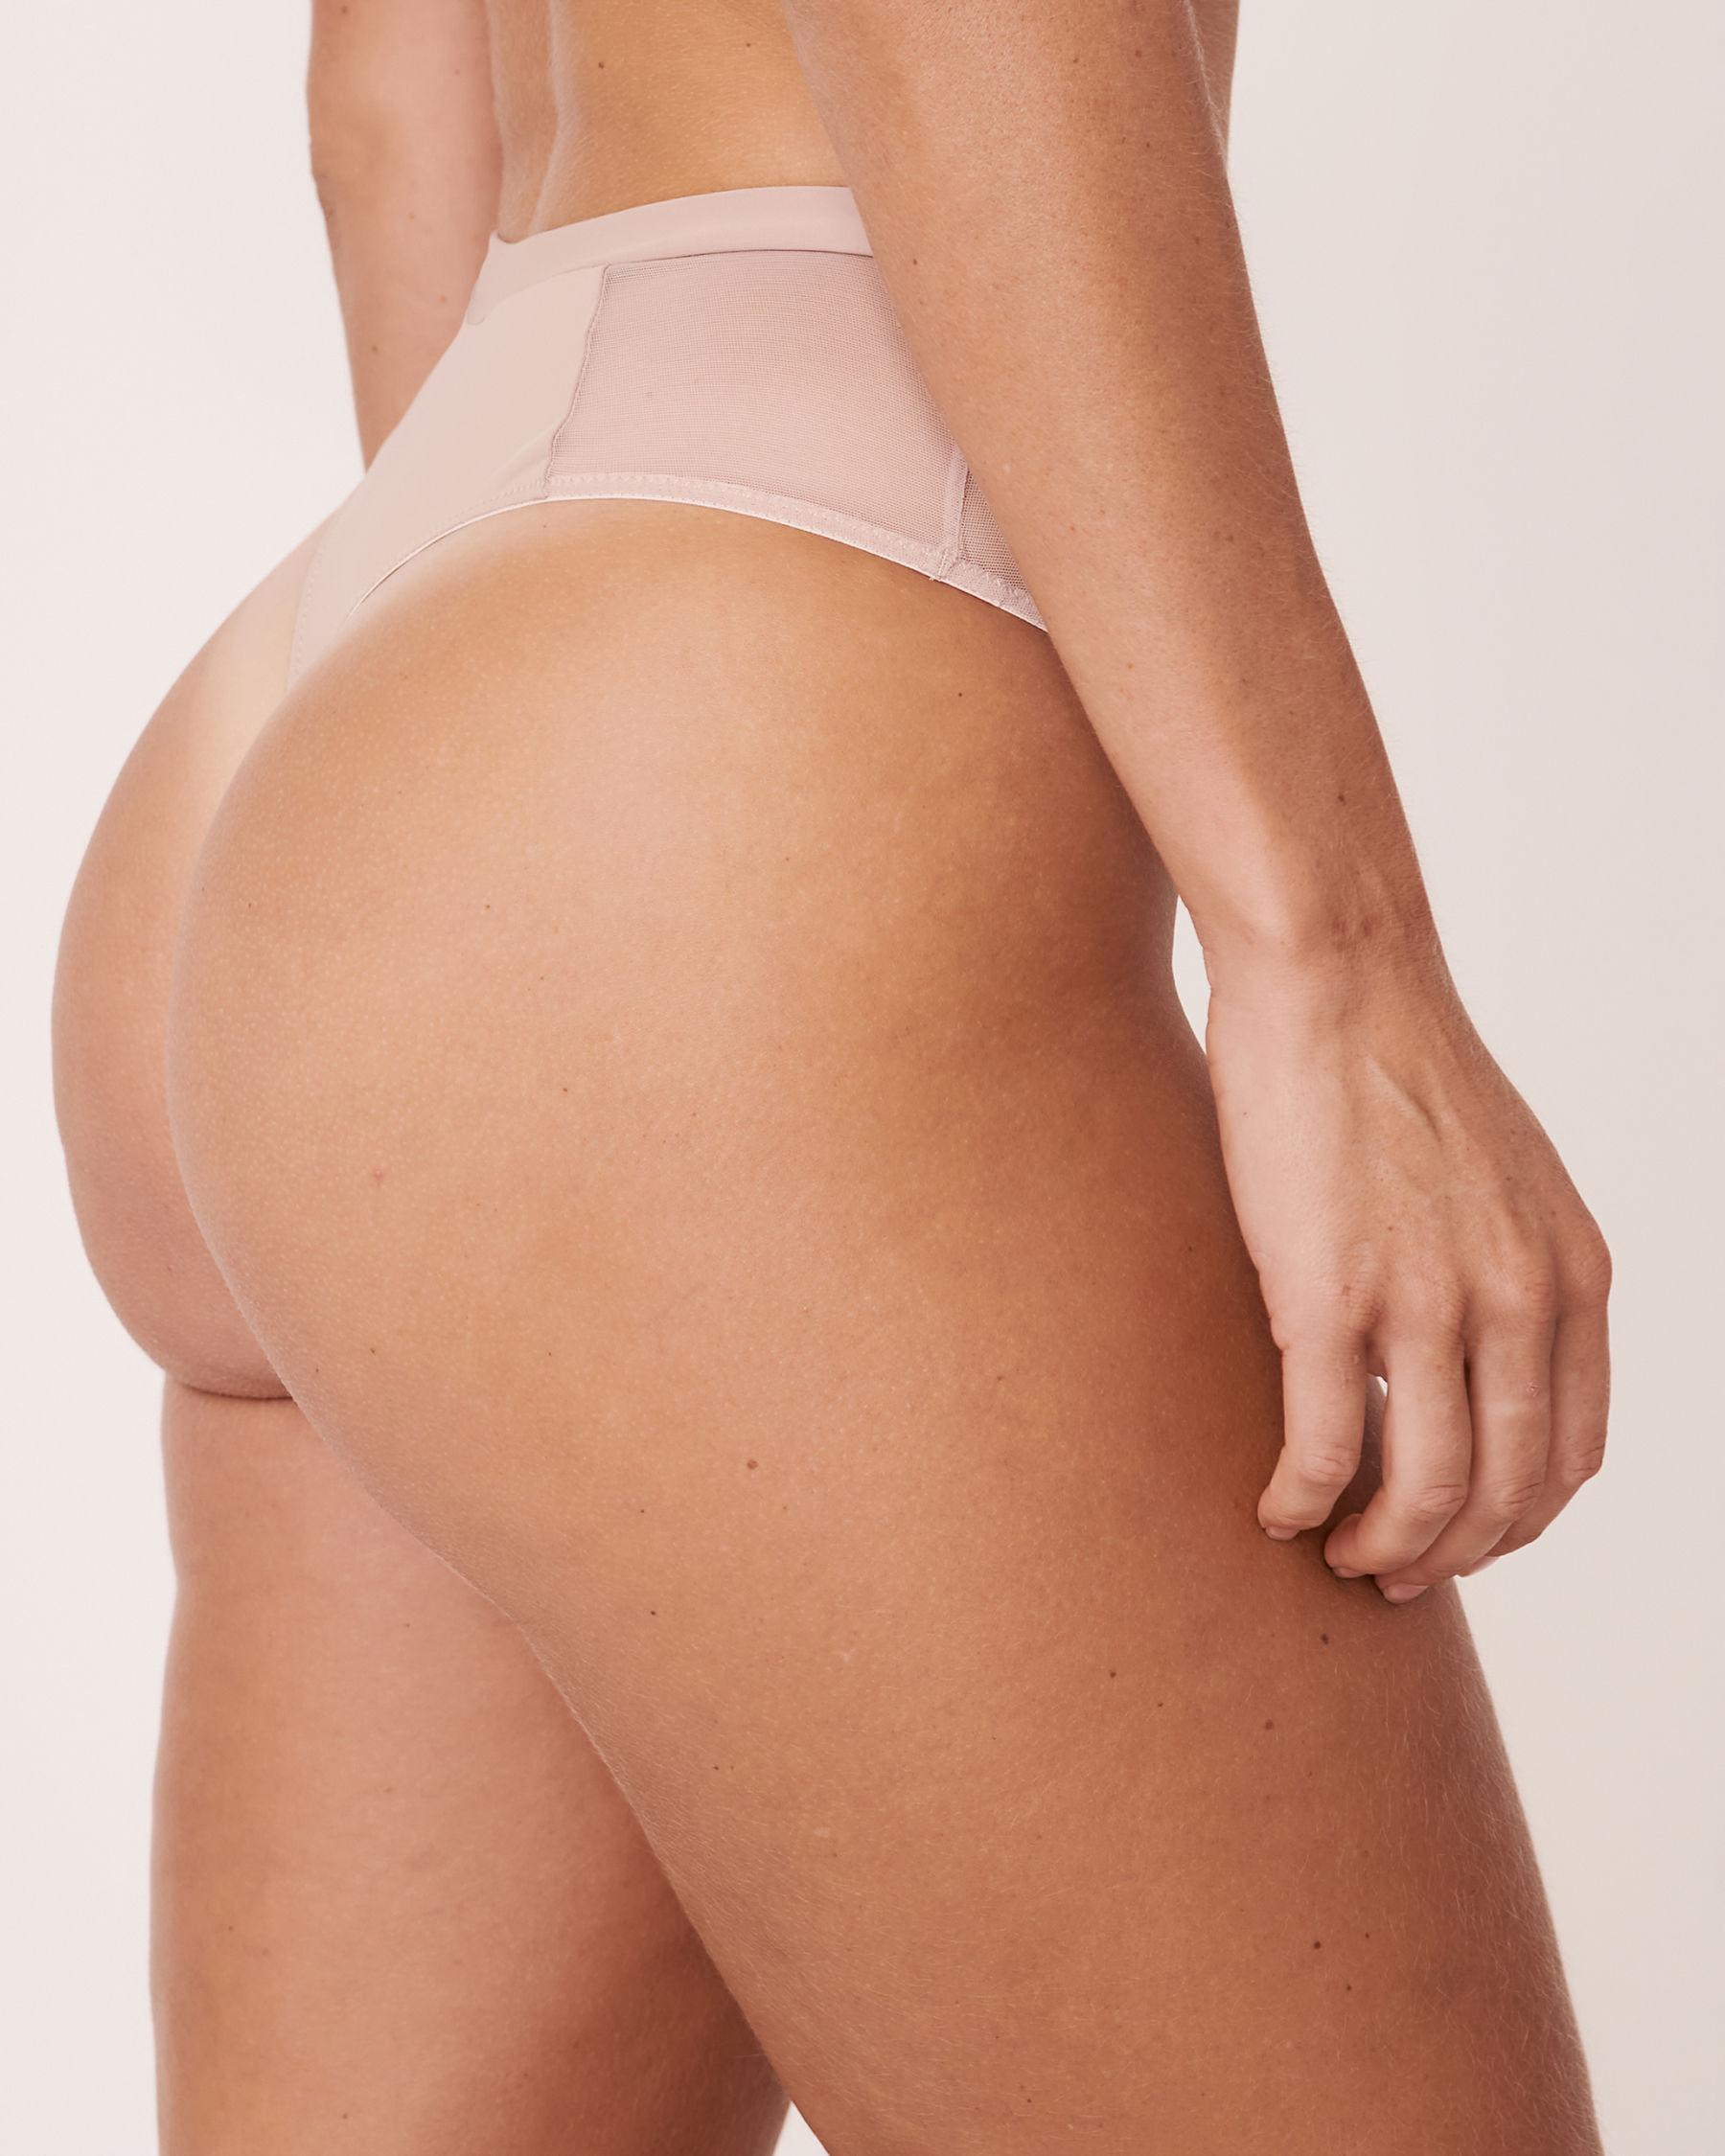 LA VIE EN ROSE High Waist Thong Panty Iris embroidery 20300041 - View2